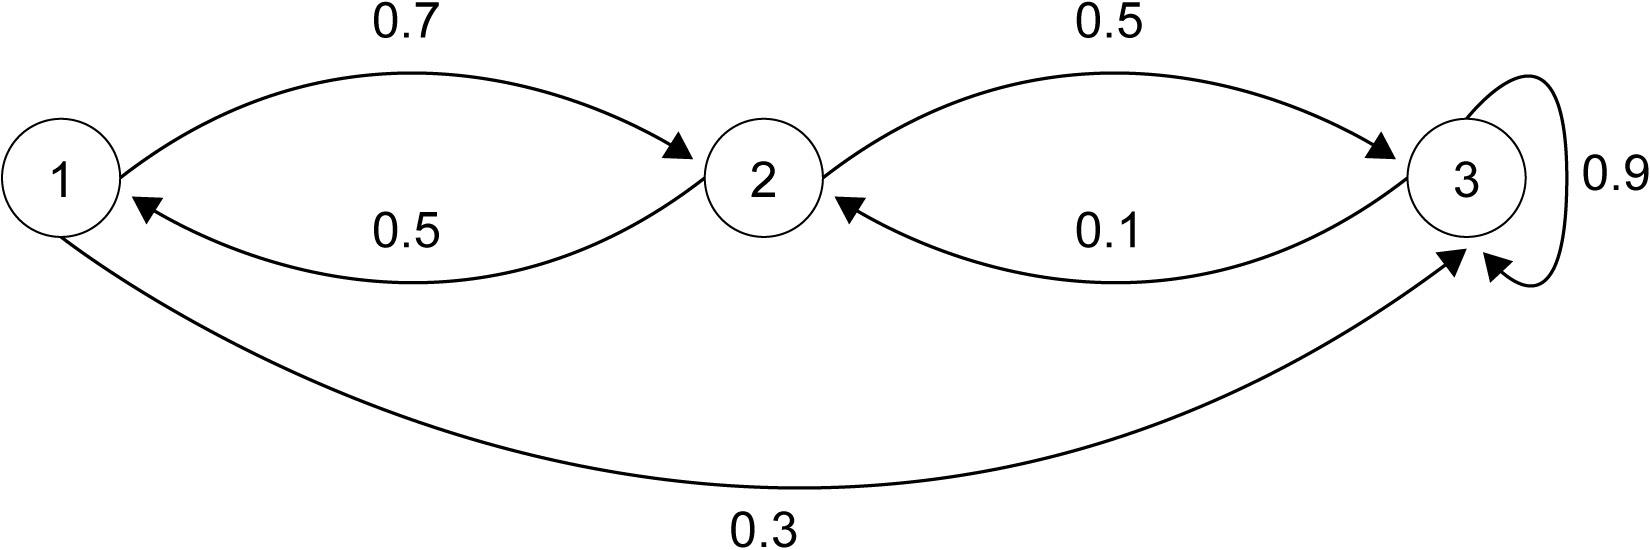 Figure 2.6: MC with three states